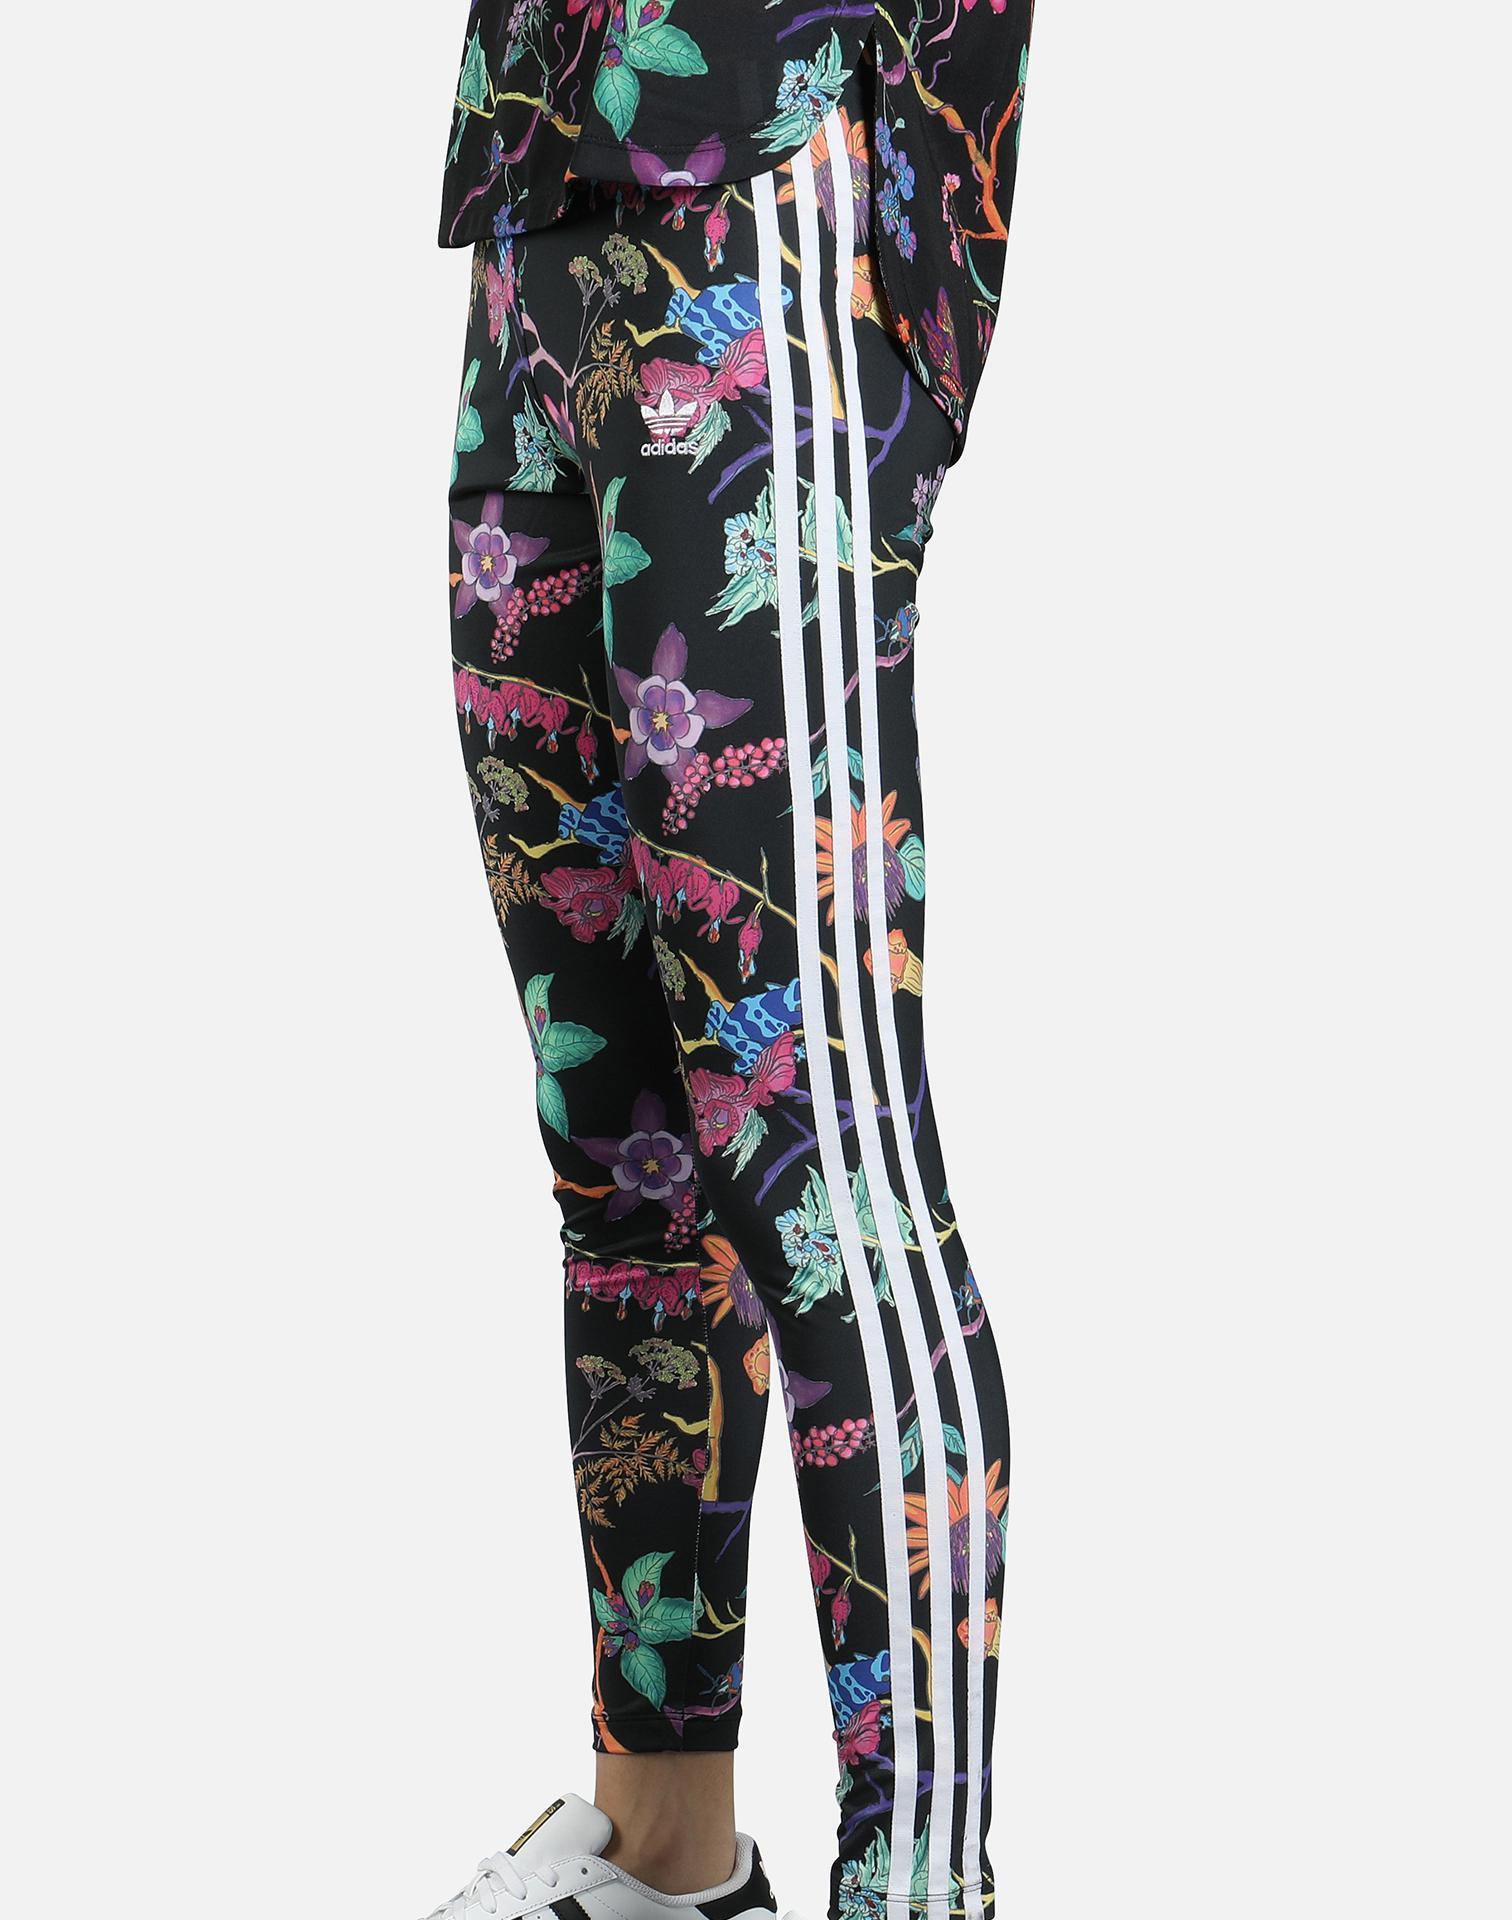 1404821100738 Lyst - Adidas Poisonous Garden Leggings